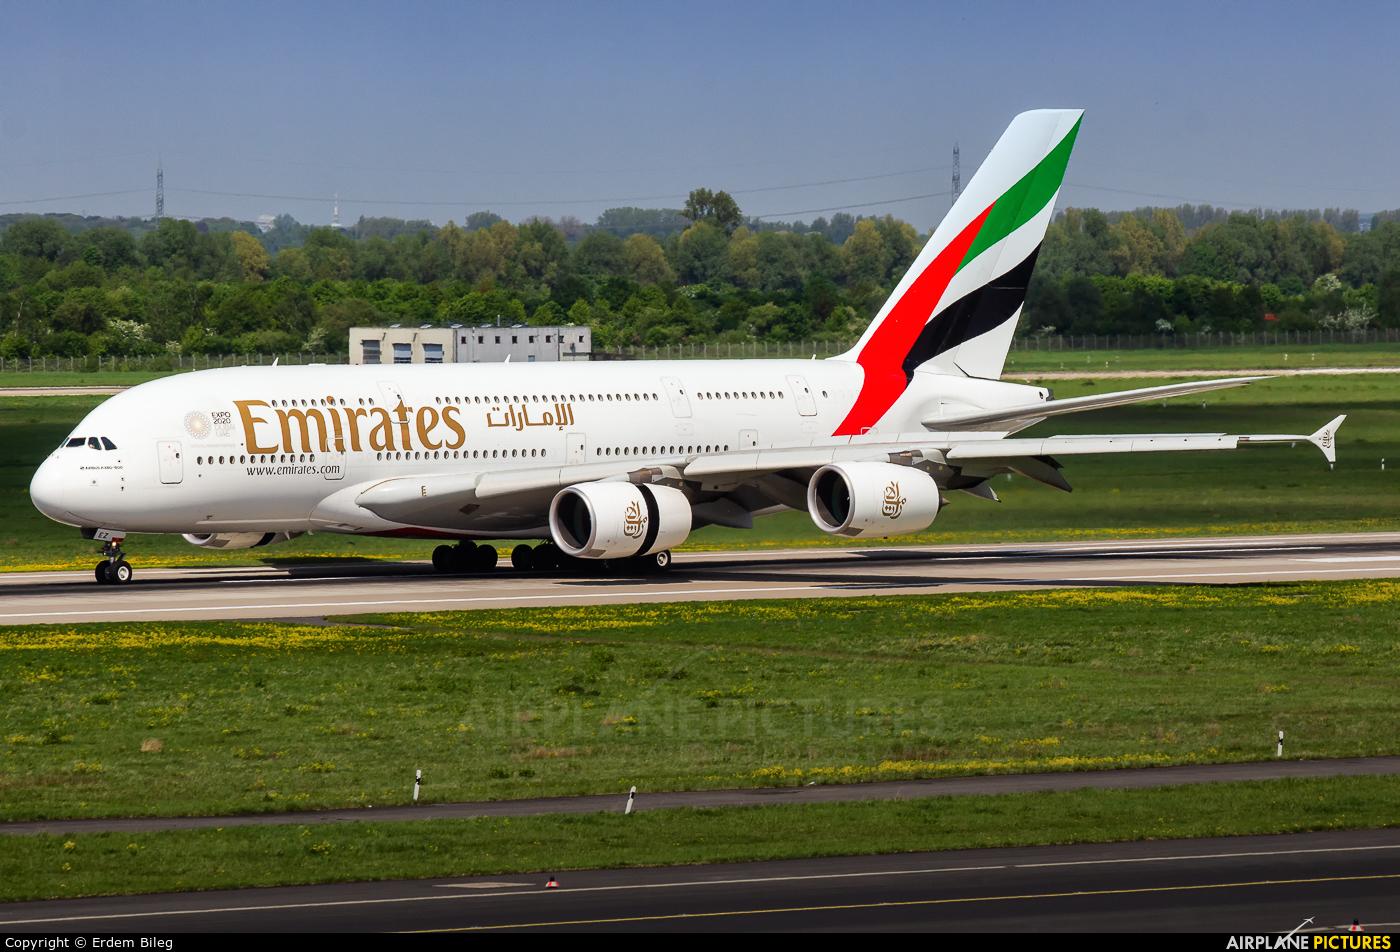 Emirates Airlines A6-EEZ aircraft at Düsseldorf